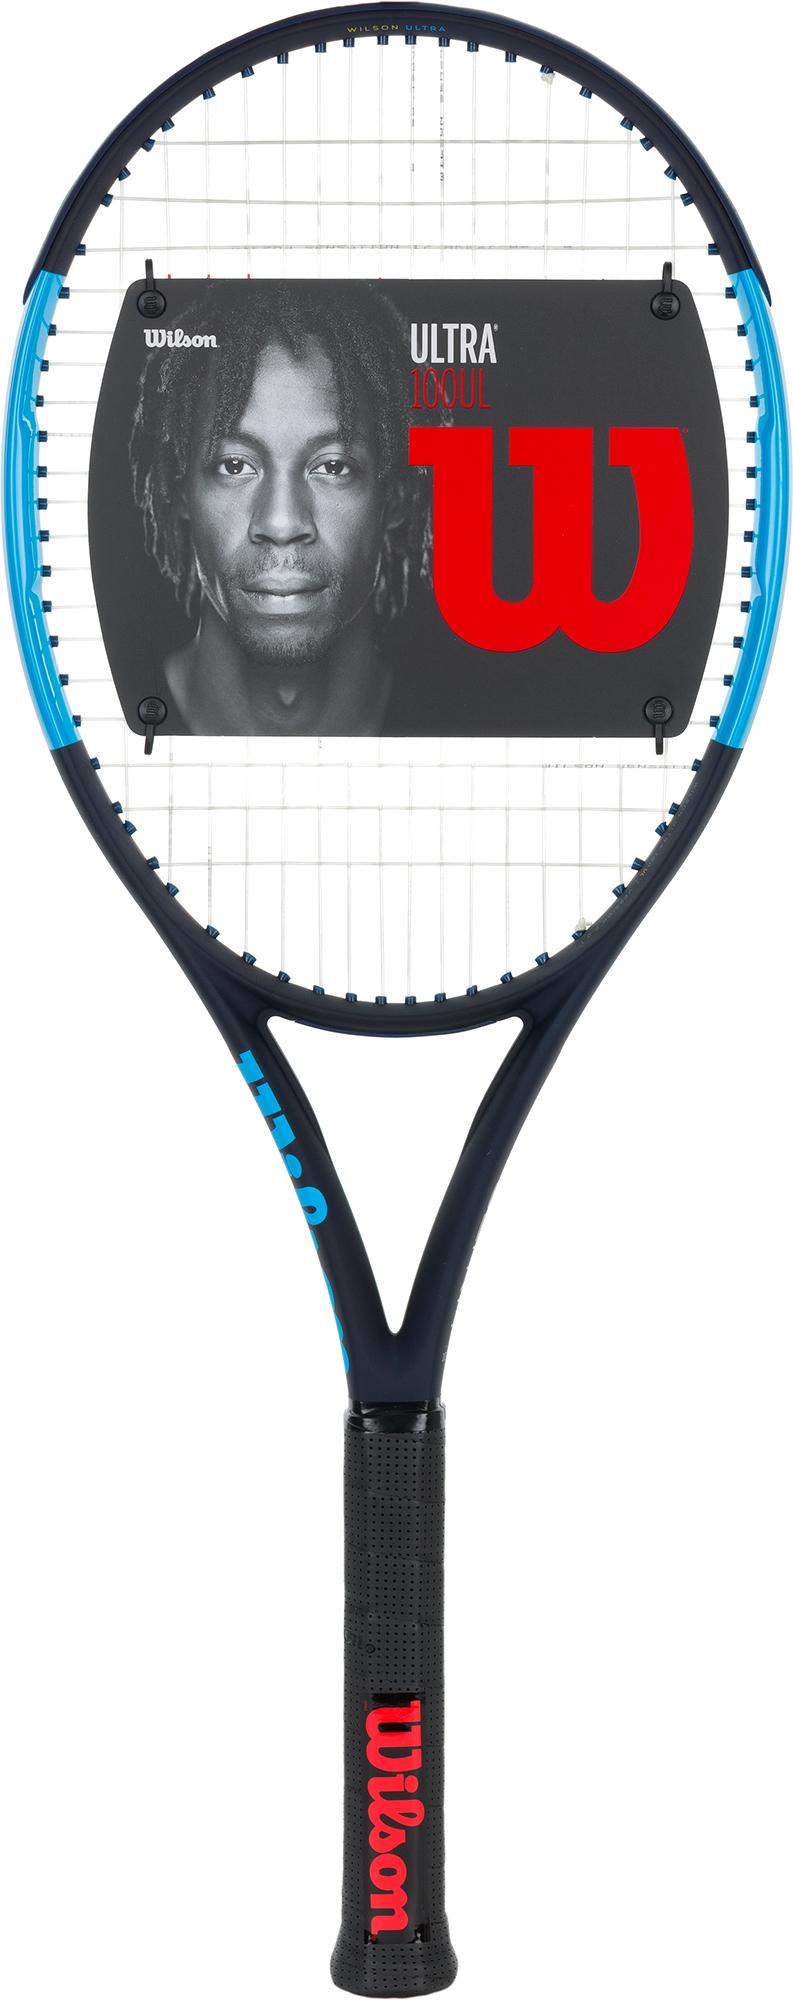 Wilson Ракетка для большого тенниса Wilson Ultra 100UL 27, размер 3 wilson ракетка для большого тенниса детская wilson roger federer 23 размер без размера